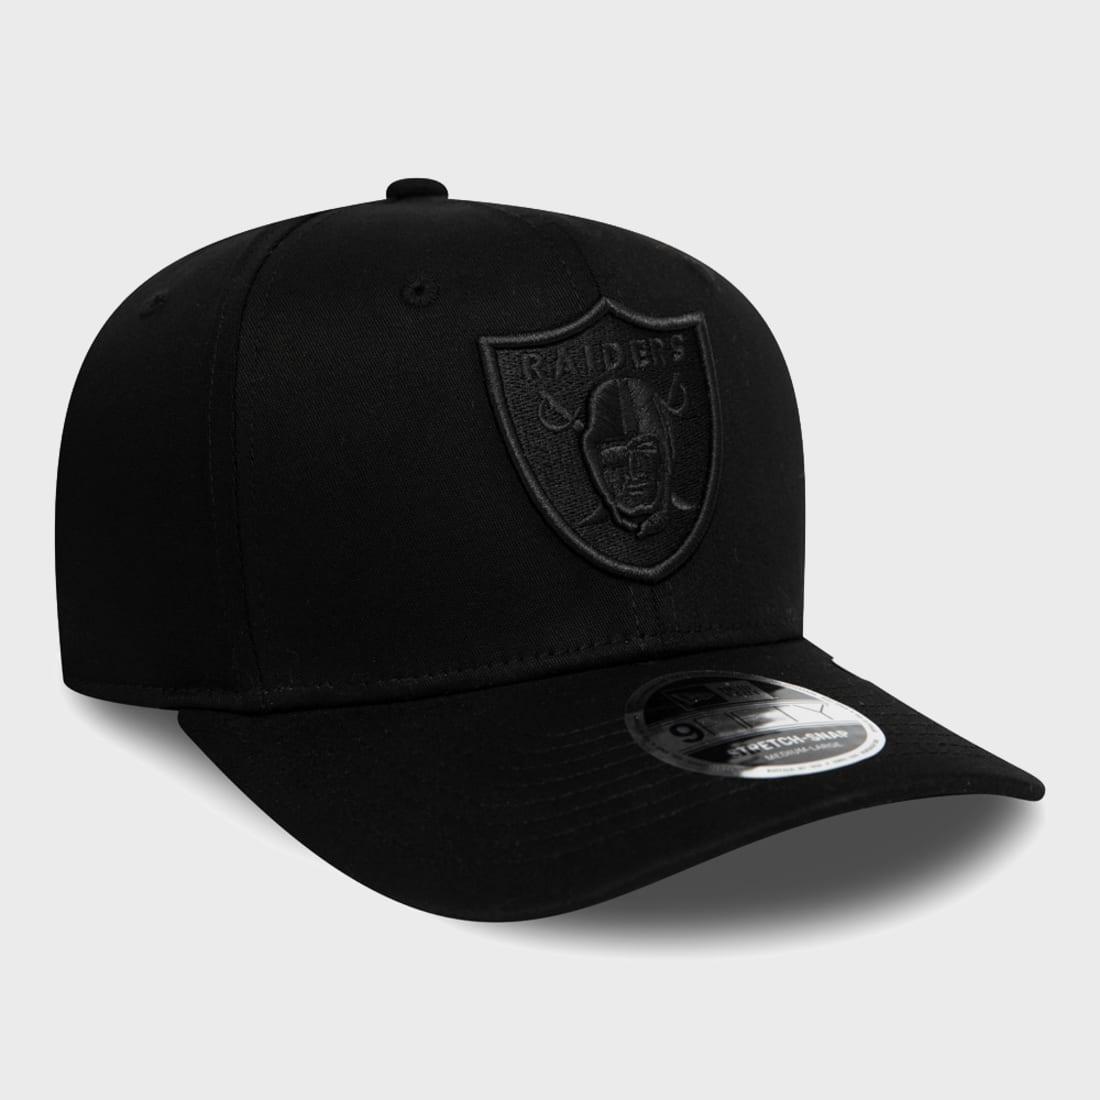 New Era Casquette Snapback 9FIFTY Stretch Snap Oakland Raiders Noir